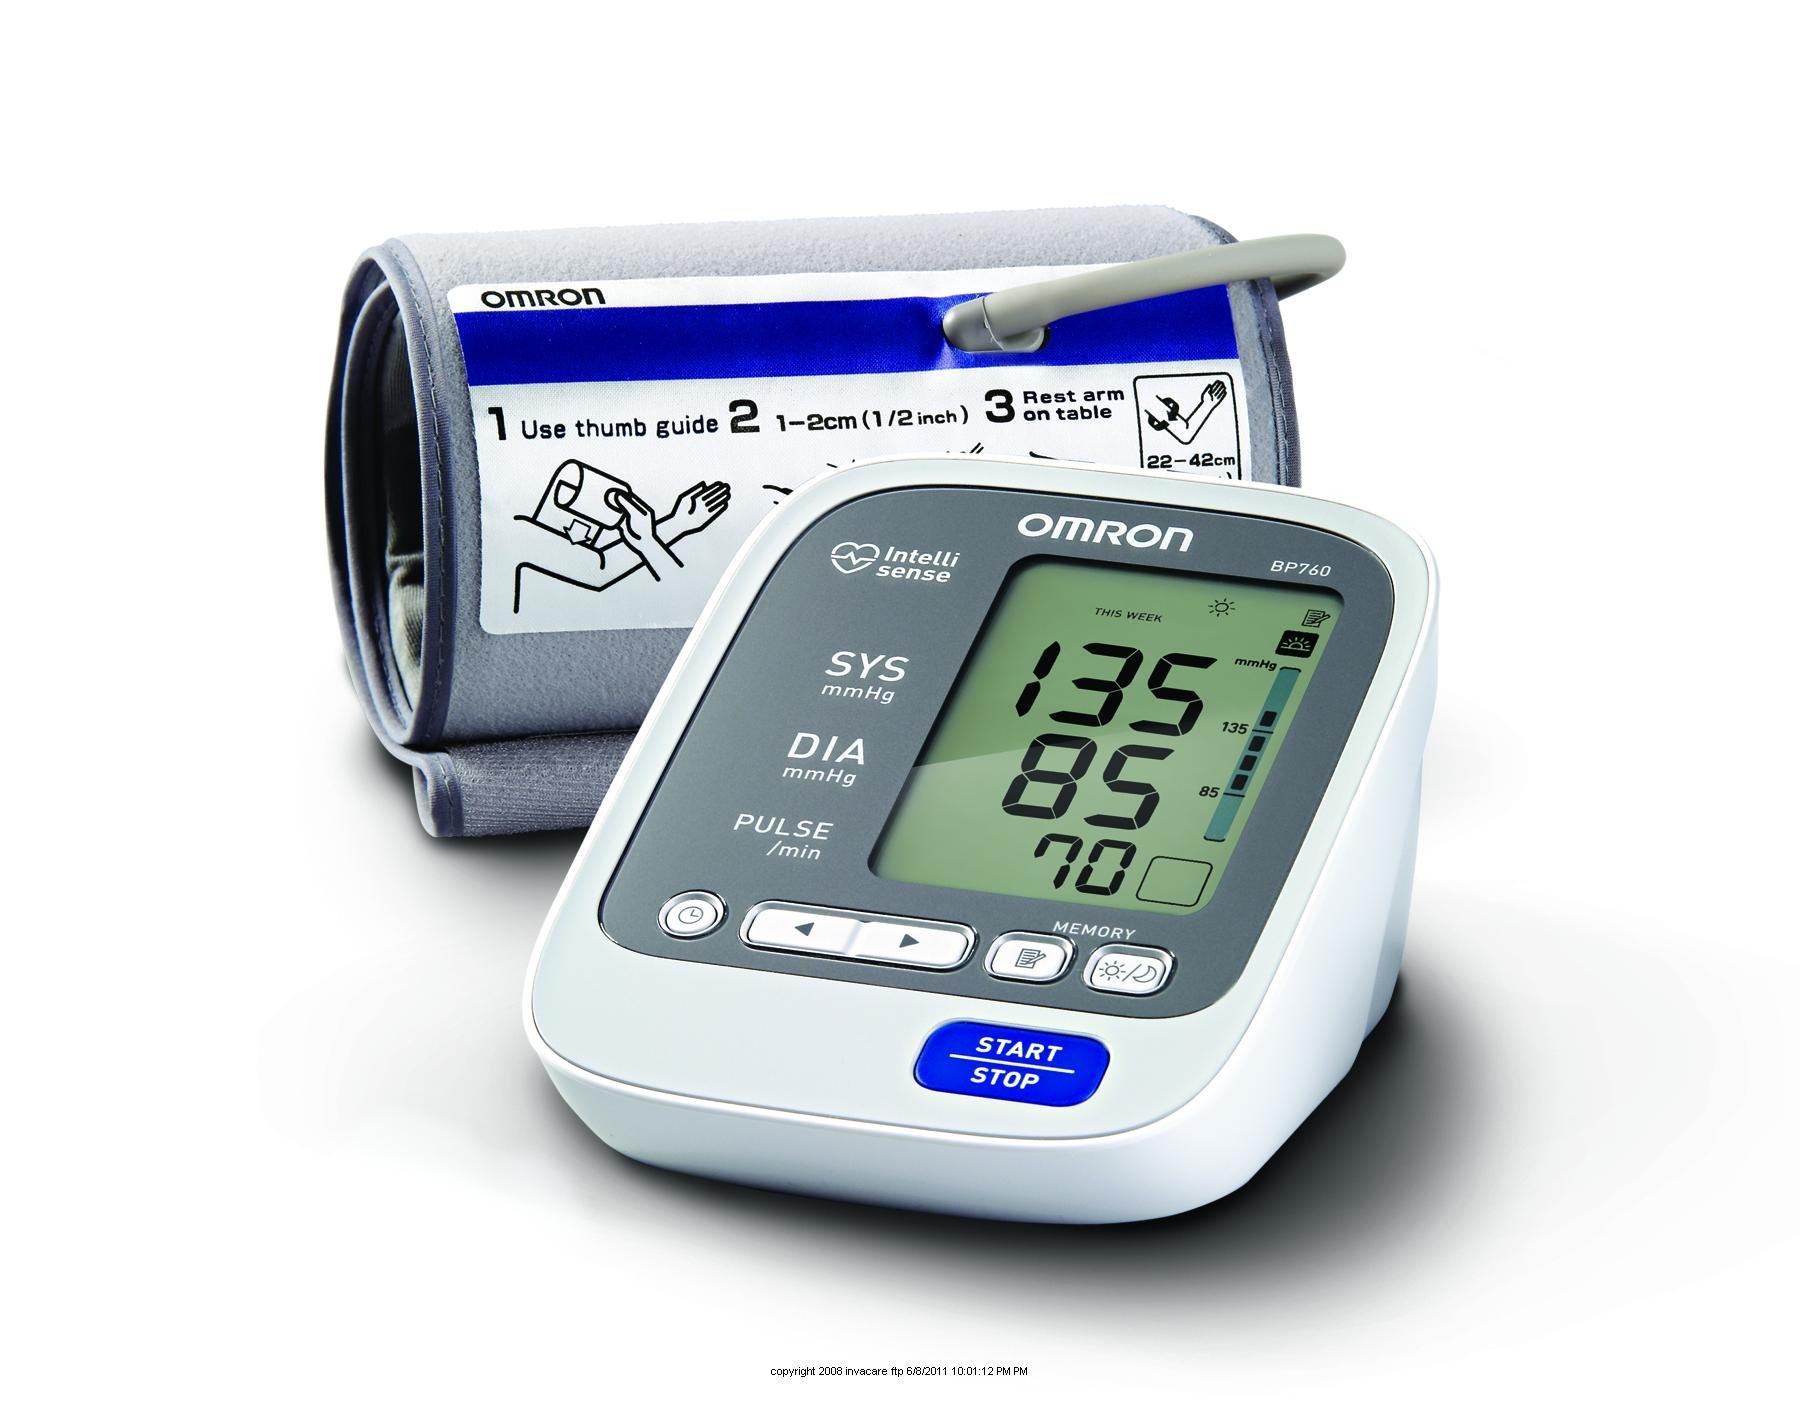 Omron 7 Series Upper Arm Blood Pressure Monitor, 7 Series Upper Arm Bp Monitor, (1 EACH, 1 EACH)